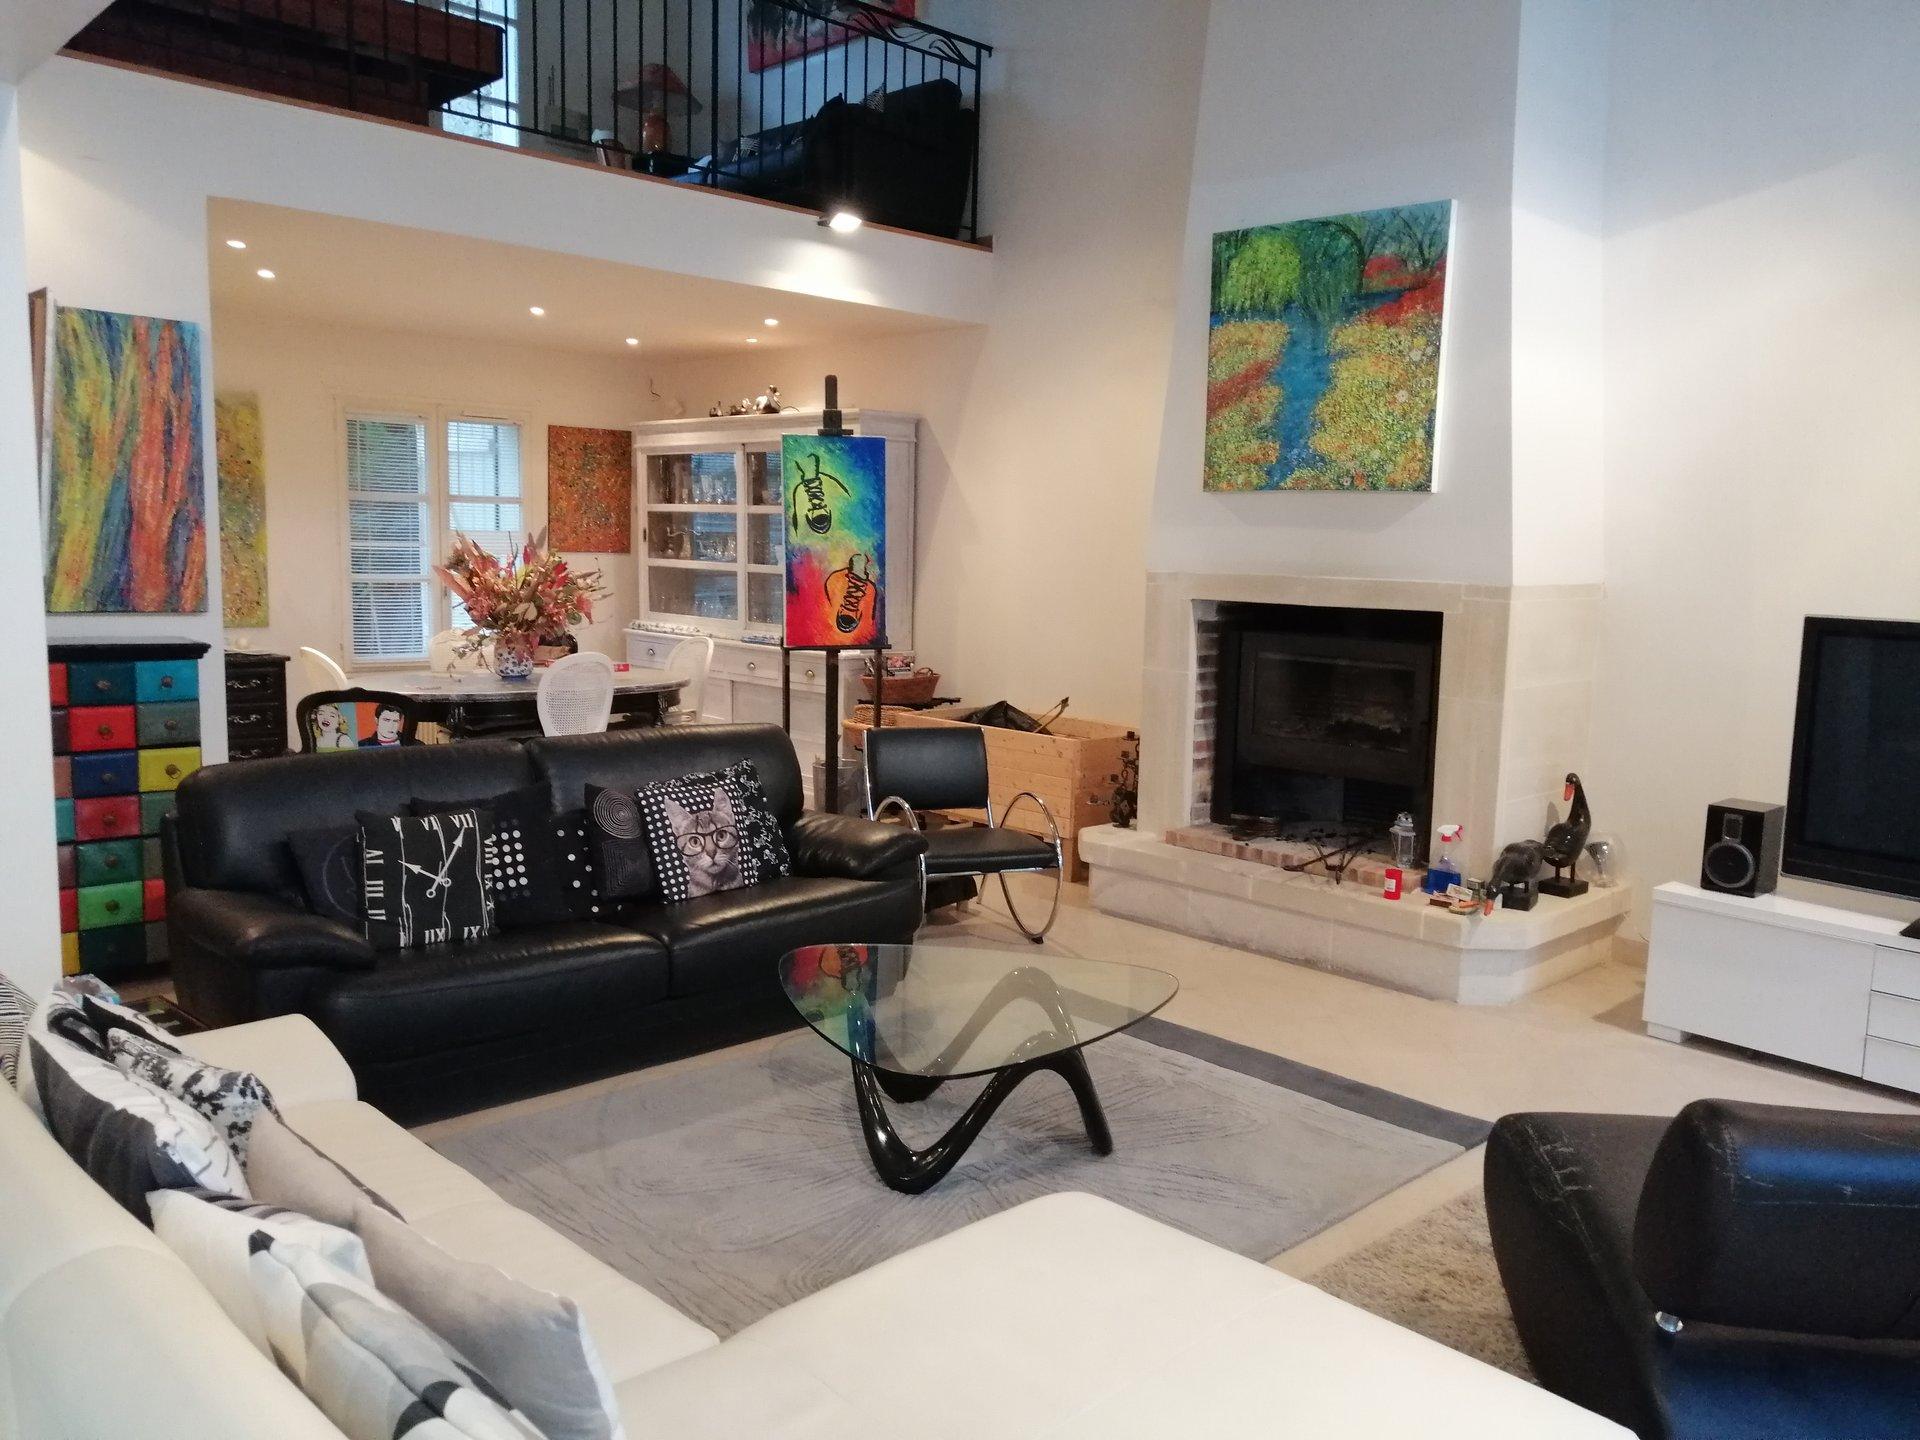 Demeure de Charme -  840 000€ FAI - Proche Senlis